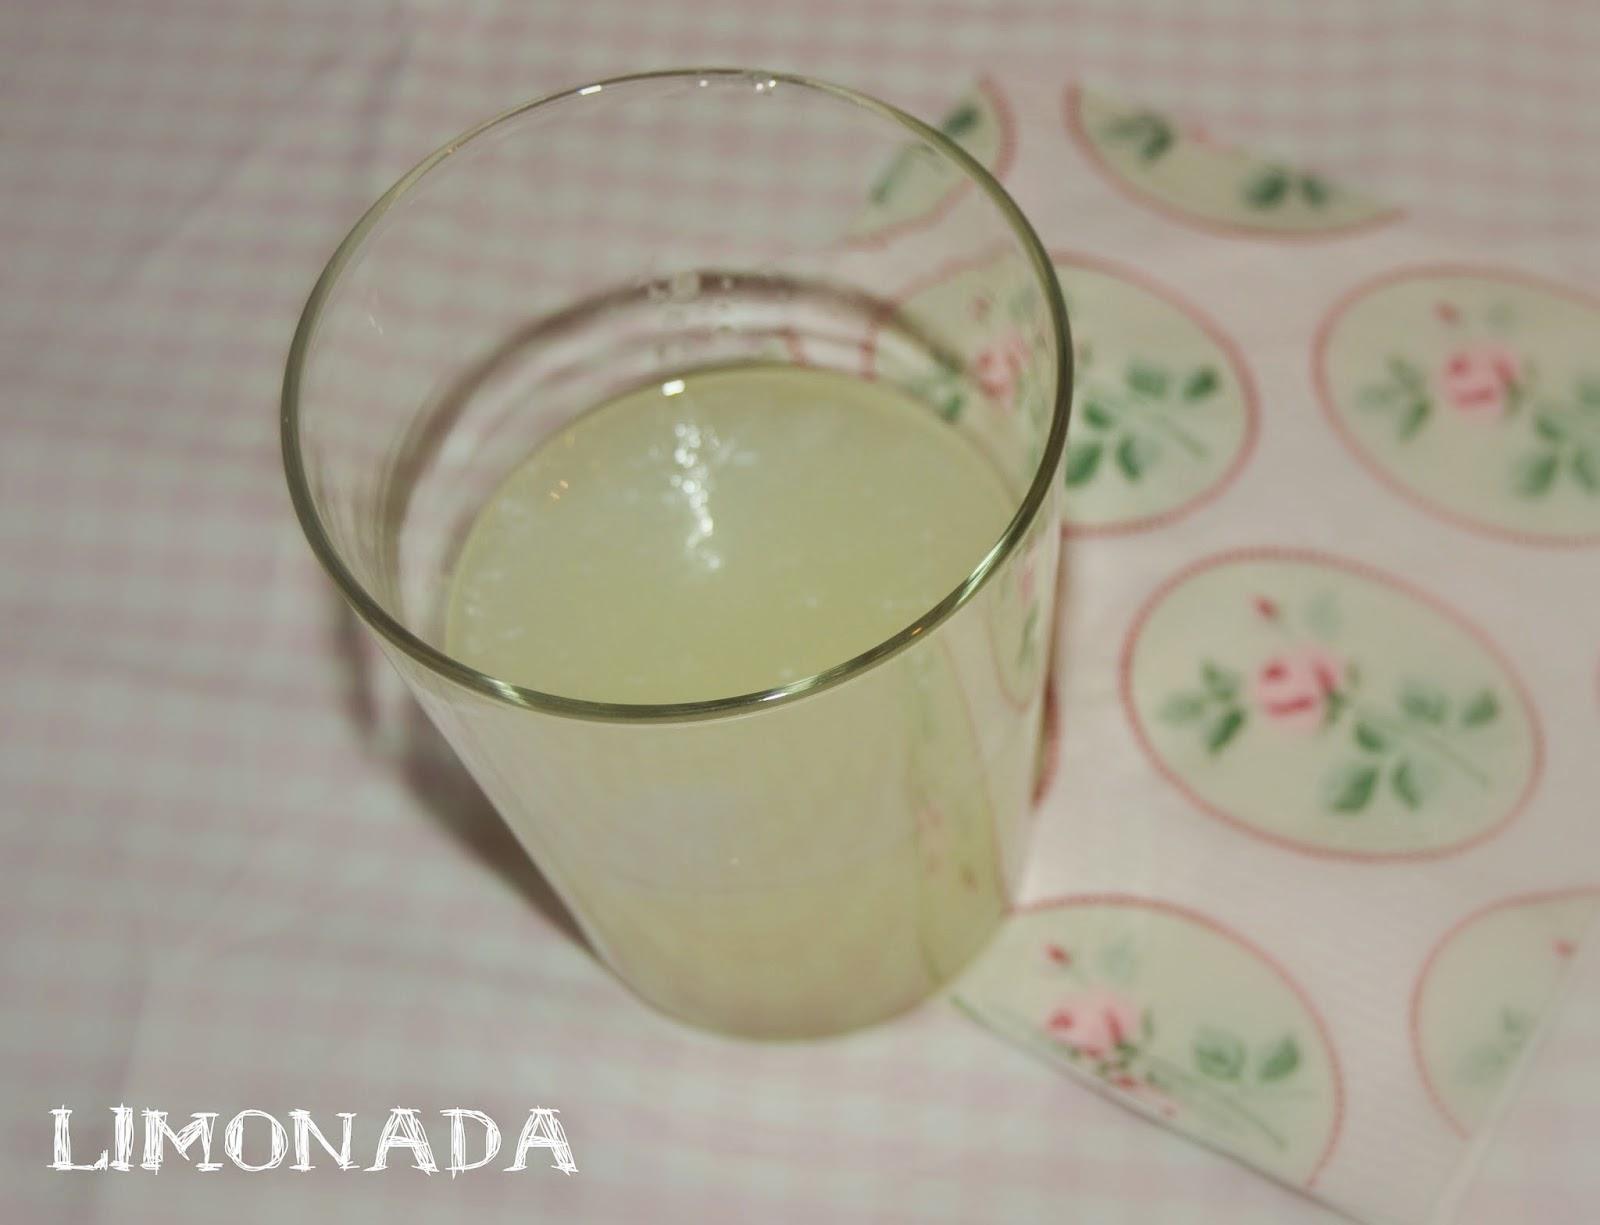 bebida refrescante limonada